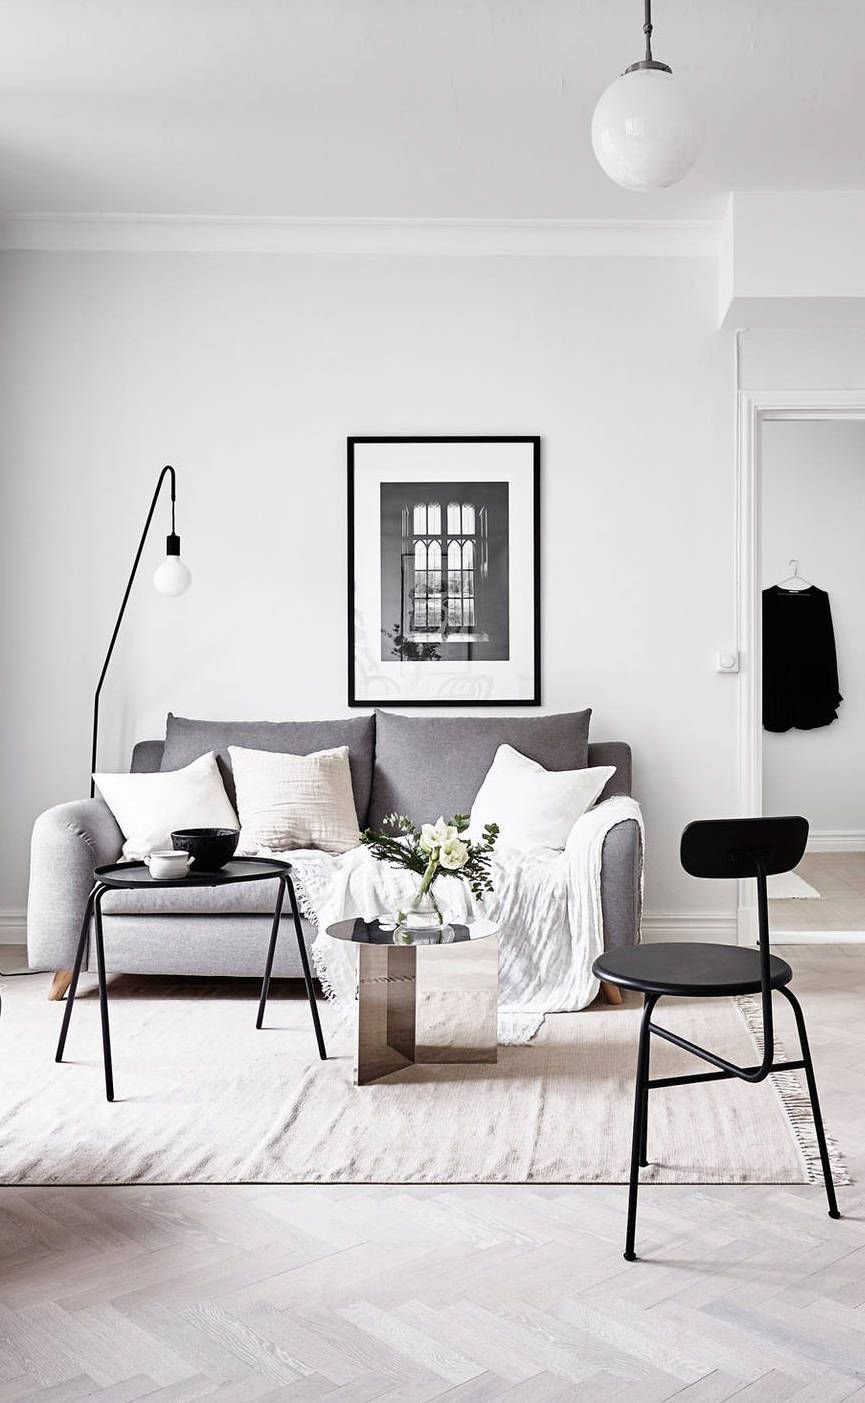 30+ Minimalist Living Room Ideas & Inspiration to Make the ...